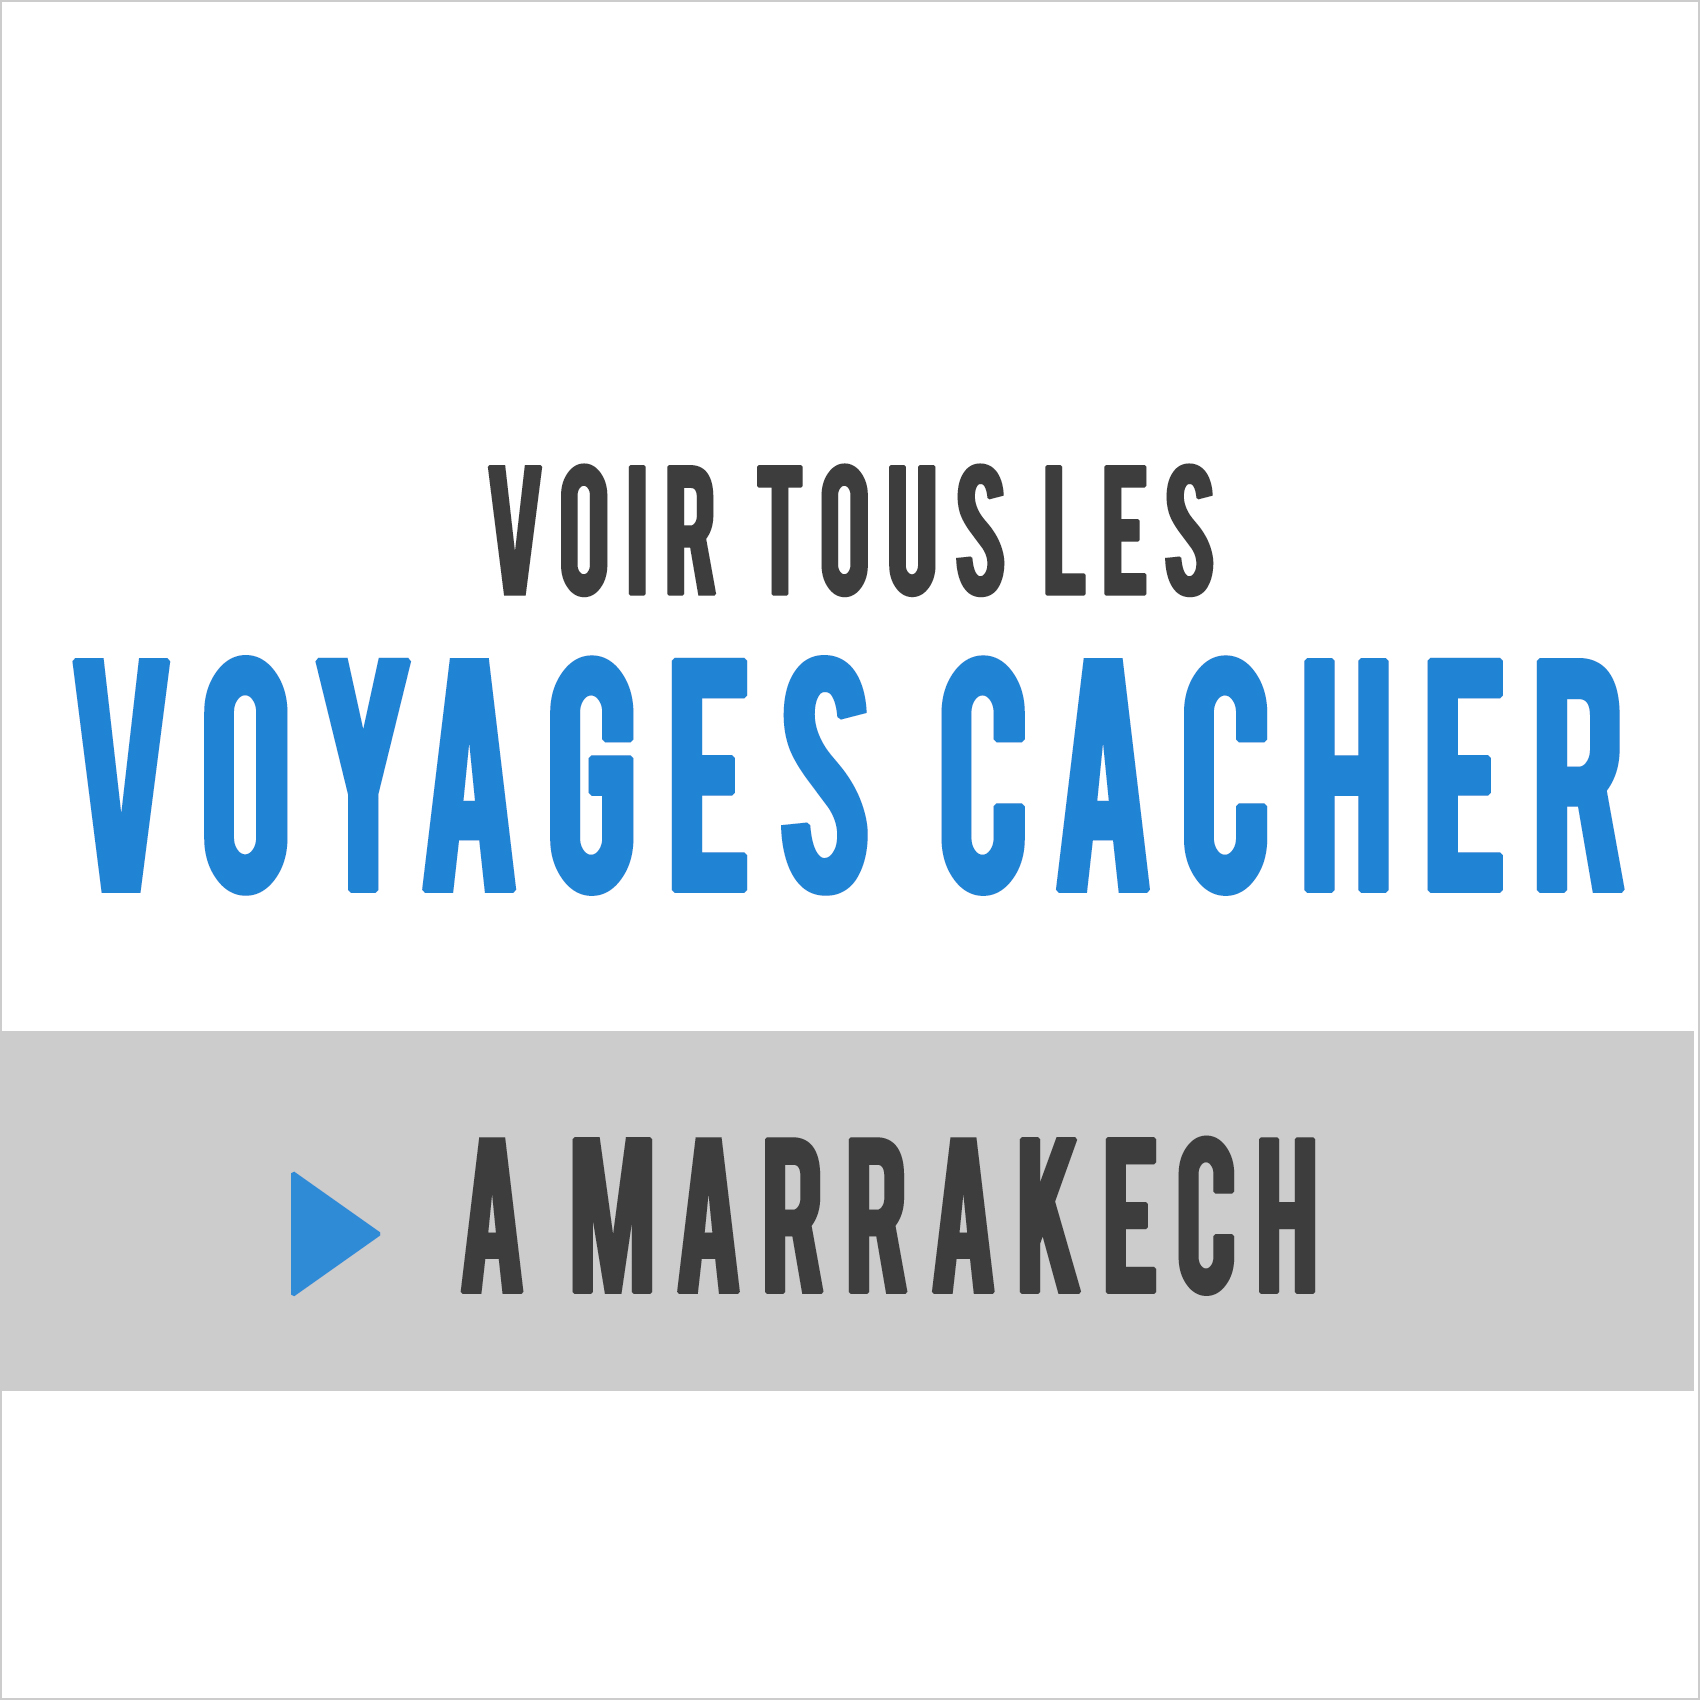 voyages cacher marrakech